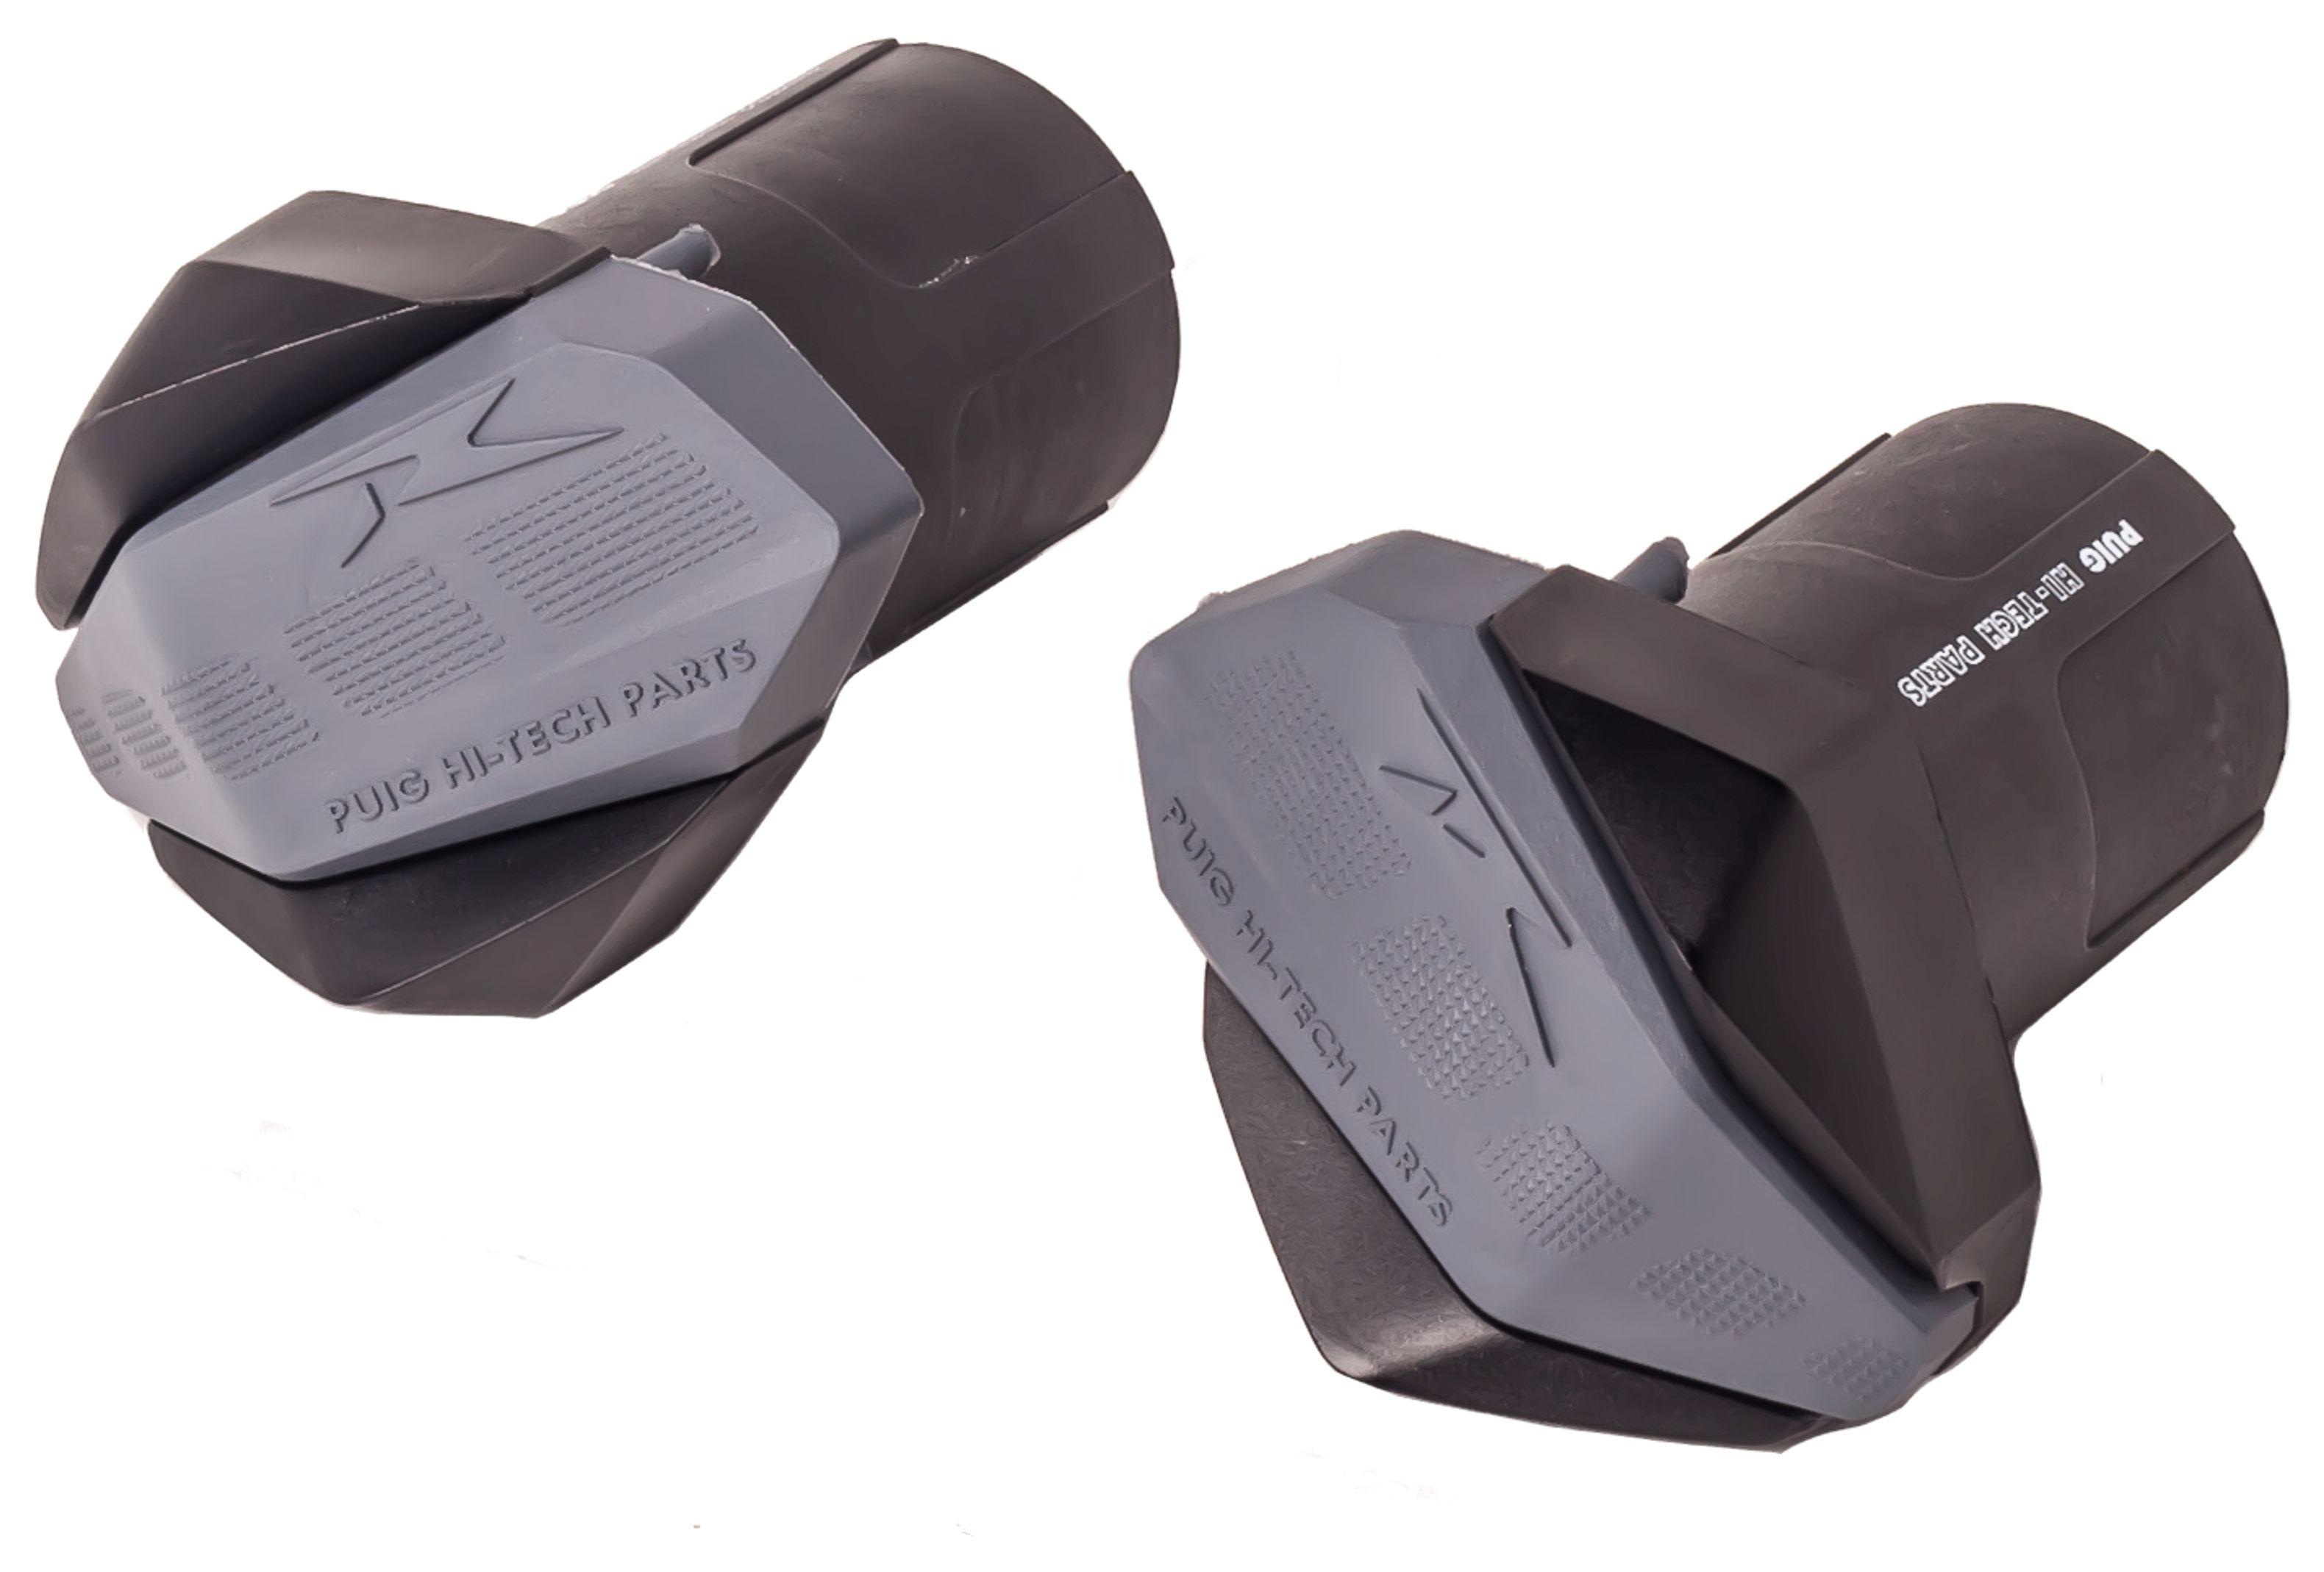 No Cut Frame Sliders Fairing Protectors For Kawasaki Z750 Z1000 750 07 2008 2009